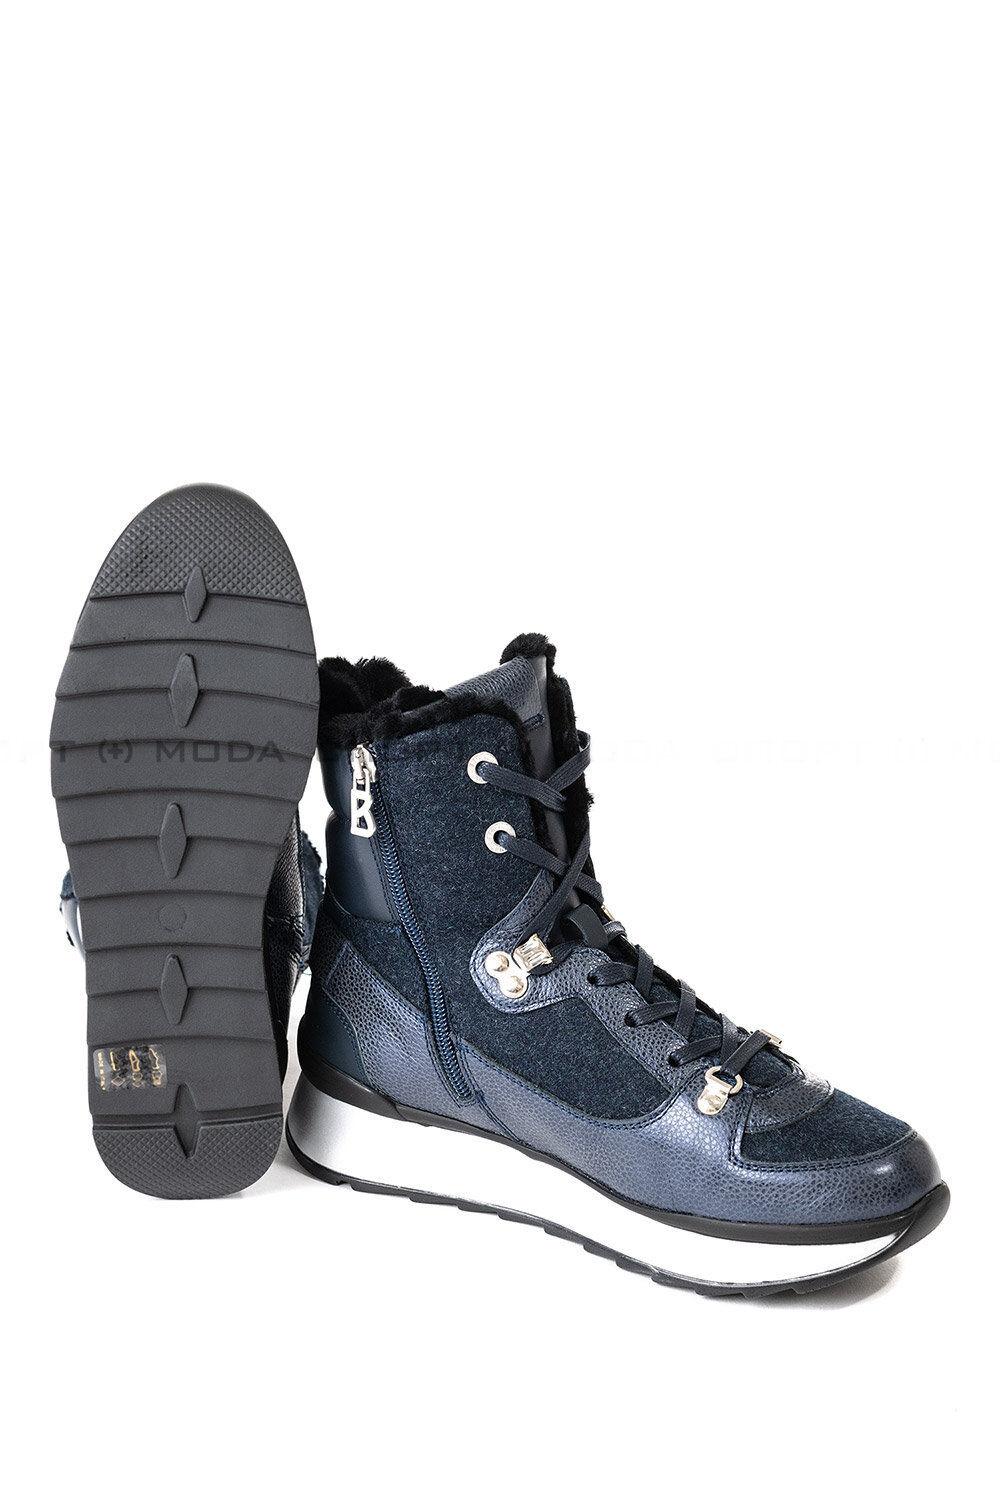 BOGNER Damen Schuhe Hohe Turnschuhe Saas Fee, Größe  36 EU -to- 40 EU   DarkBlau